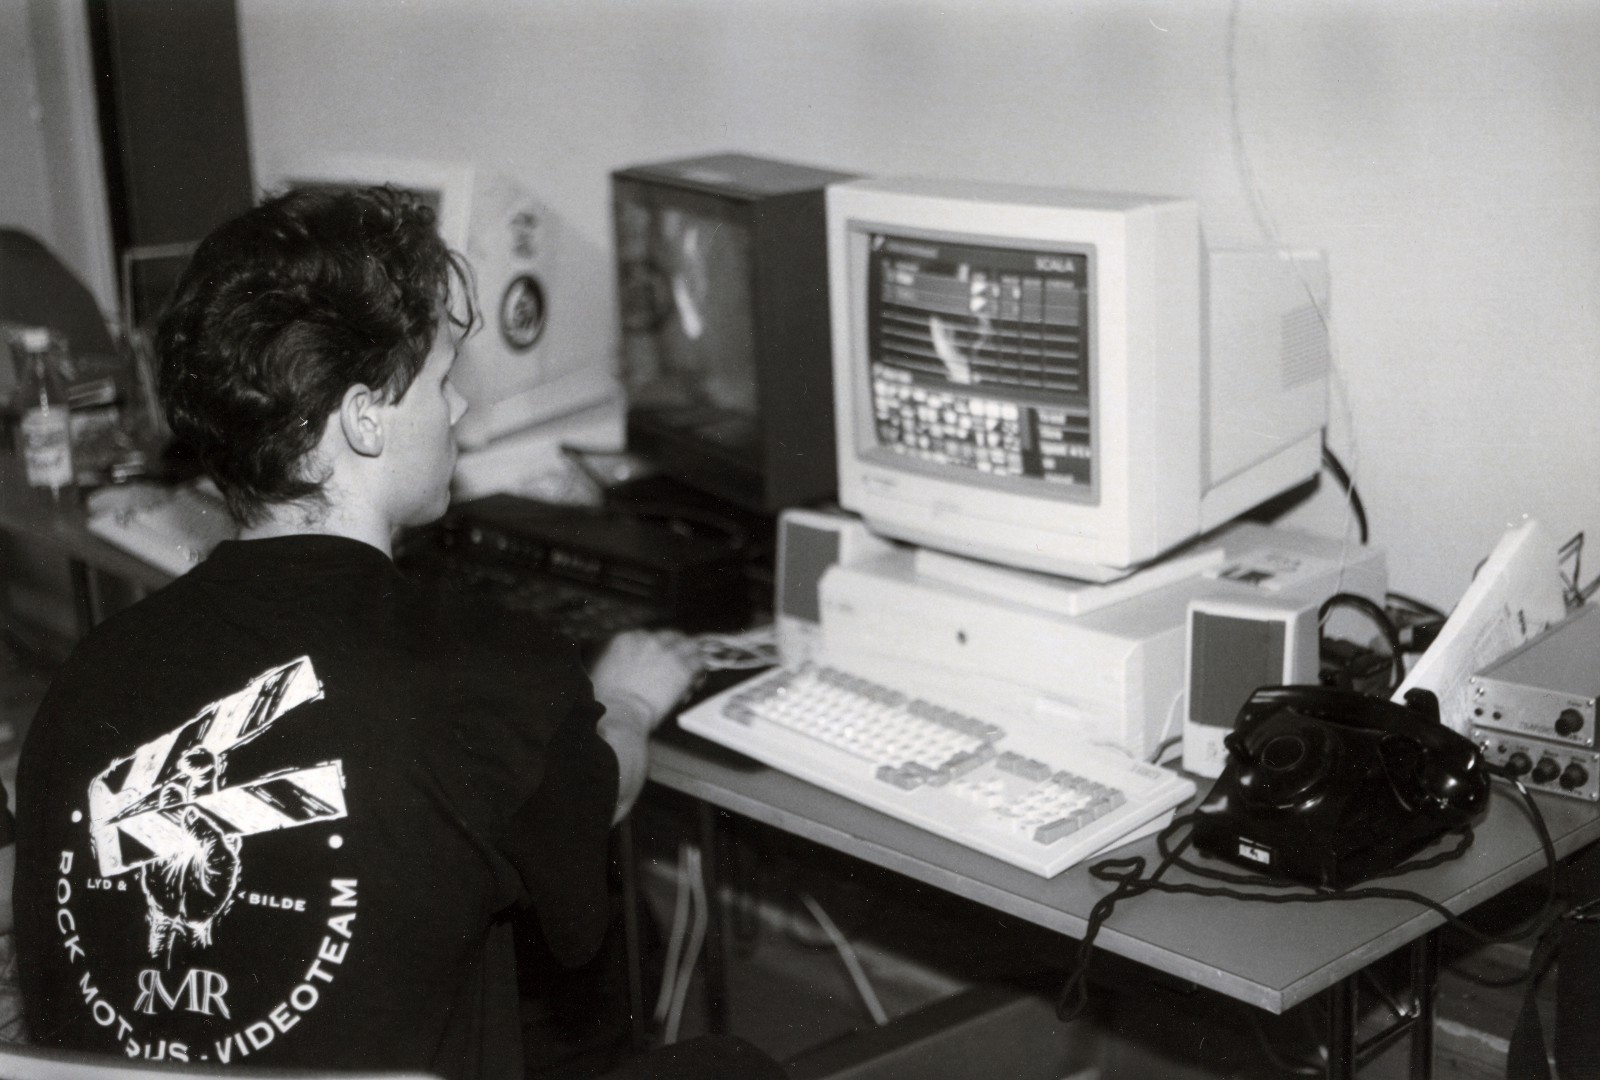 RMR Video Team 1994